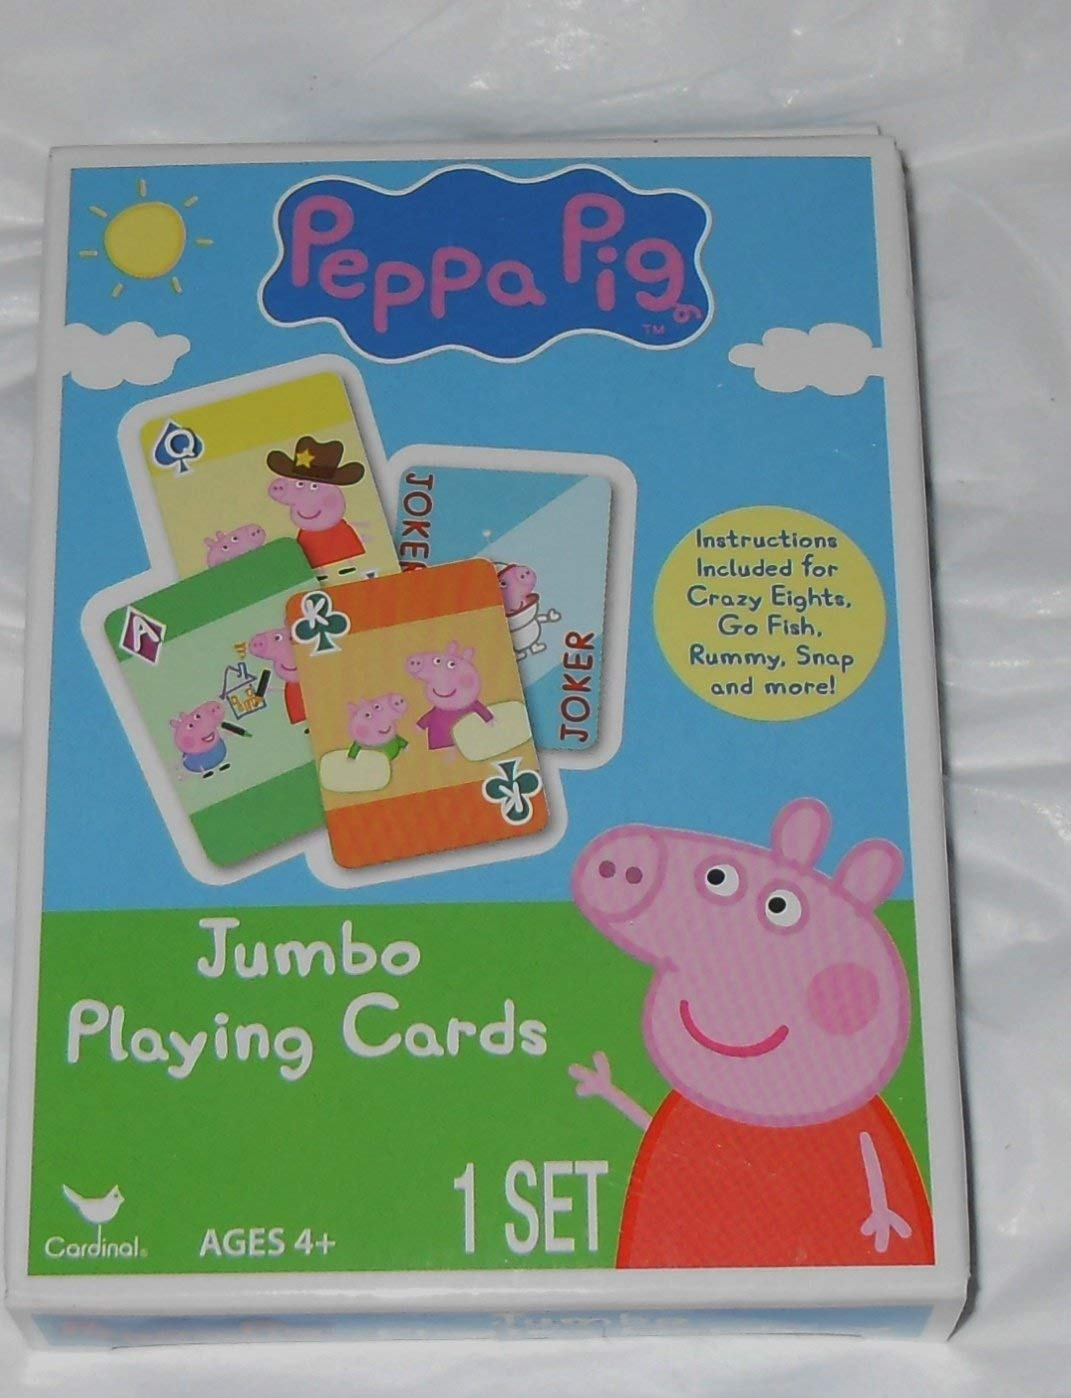 Peppa Pig Jumbo - Juego de cartas, para jugar Crazy Eights ...